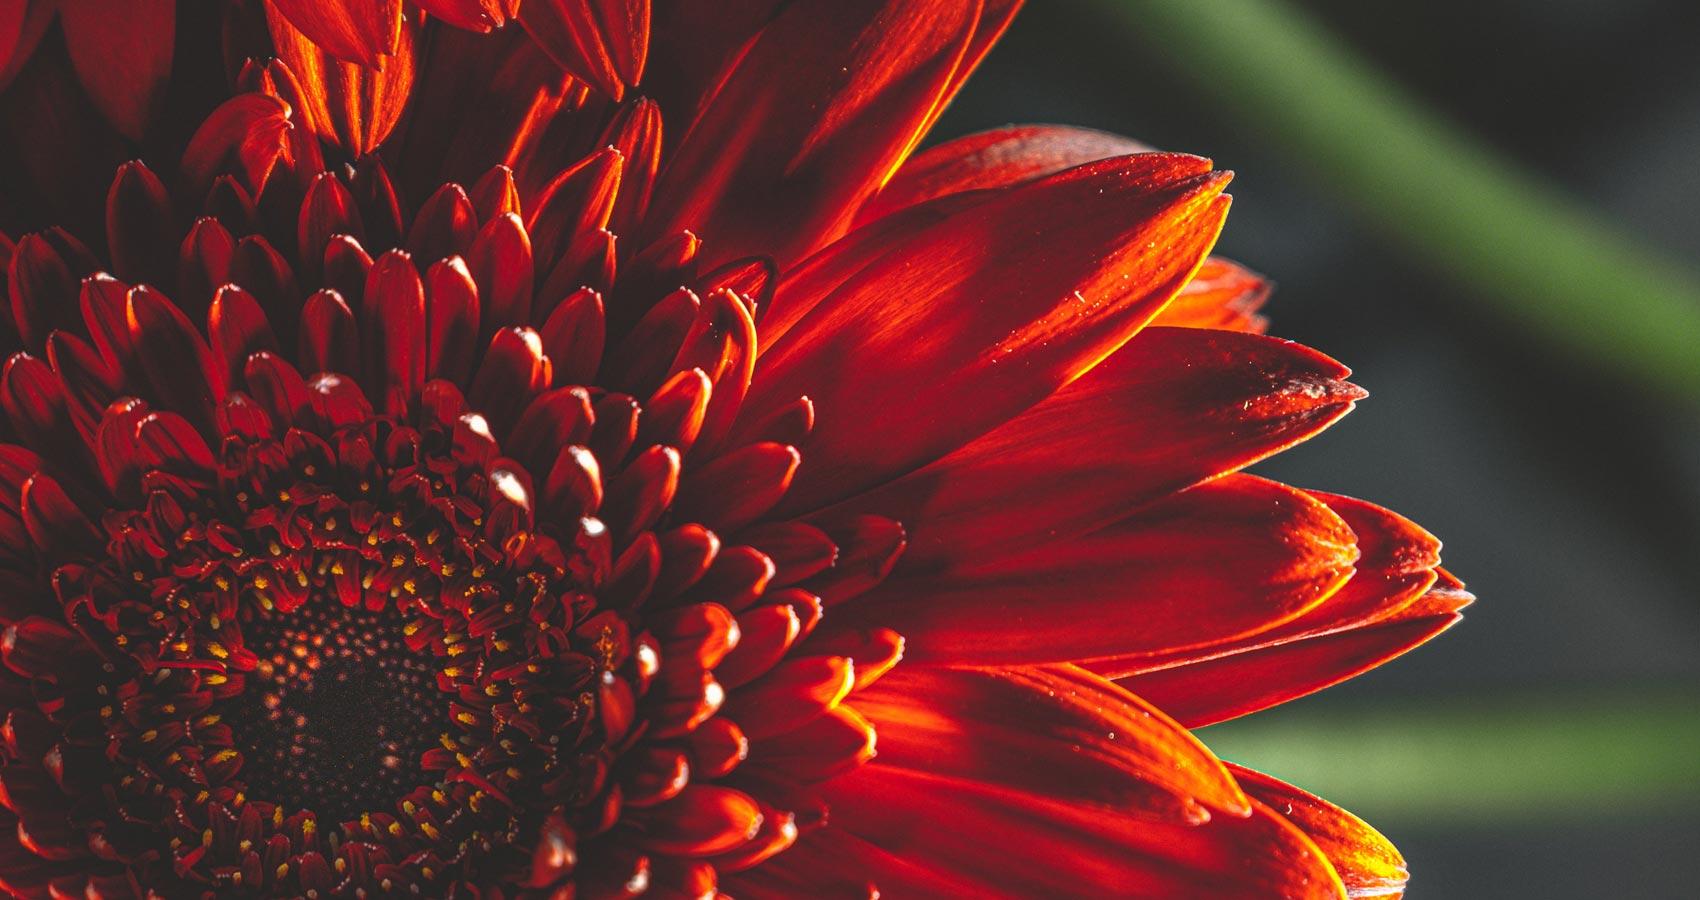 Inferno, a poem by Carmen Frech Oliveri at Spillwords.com